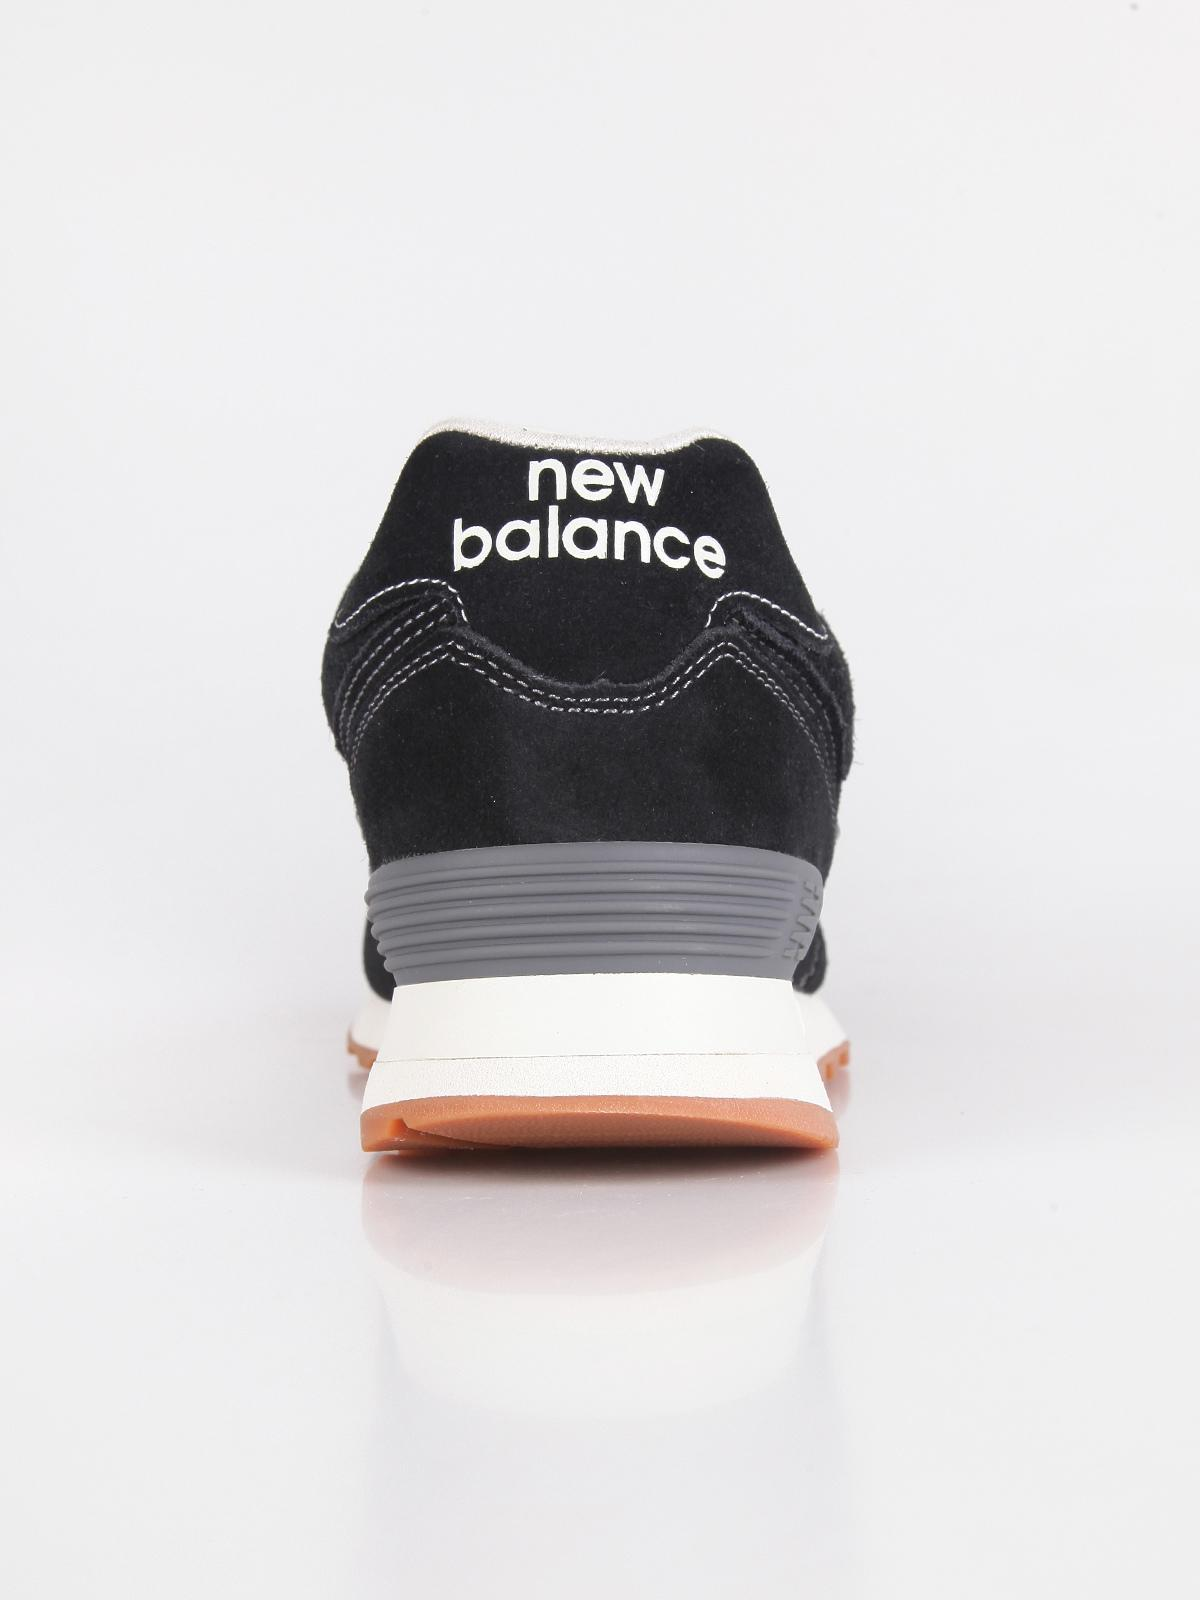 new balance hombre negras piel